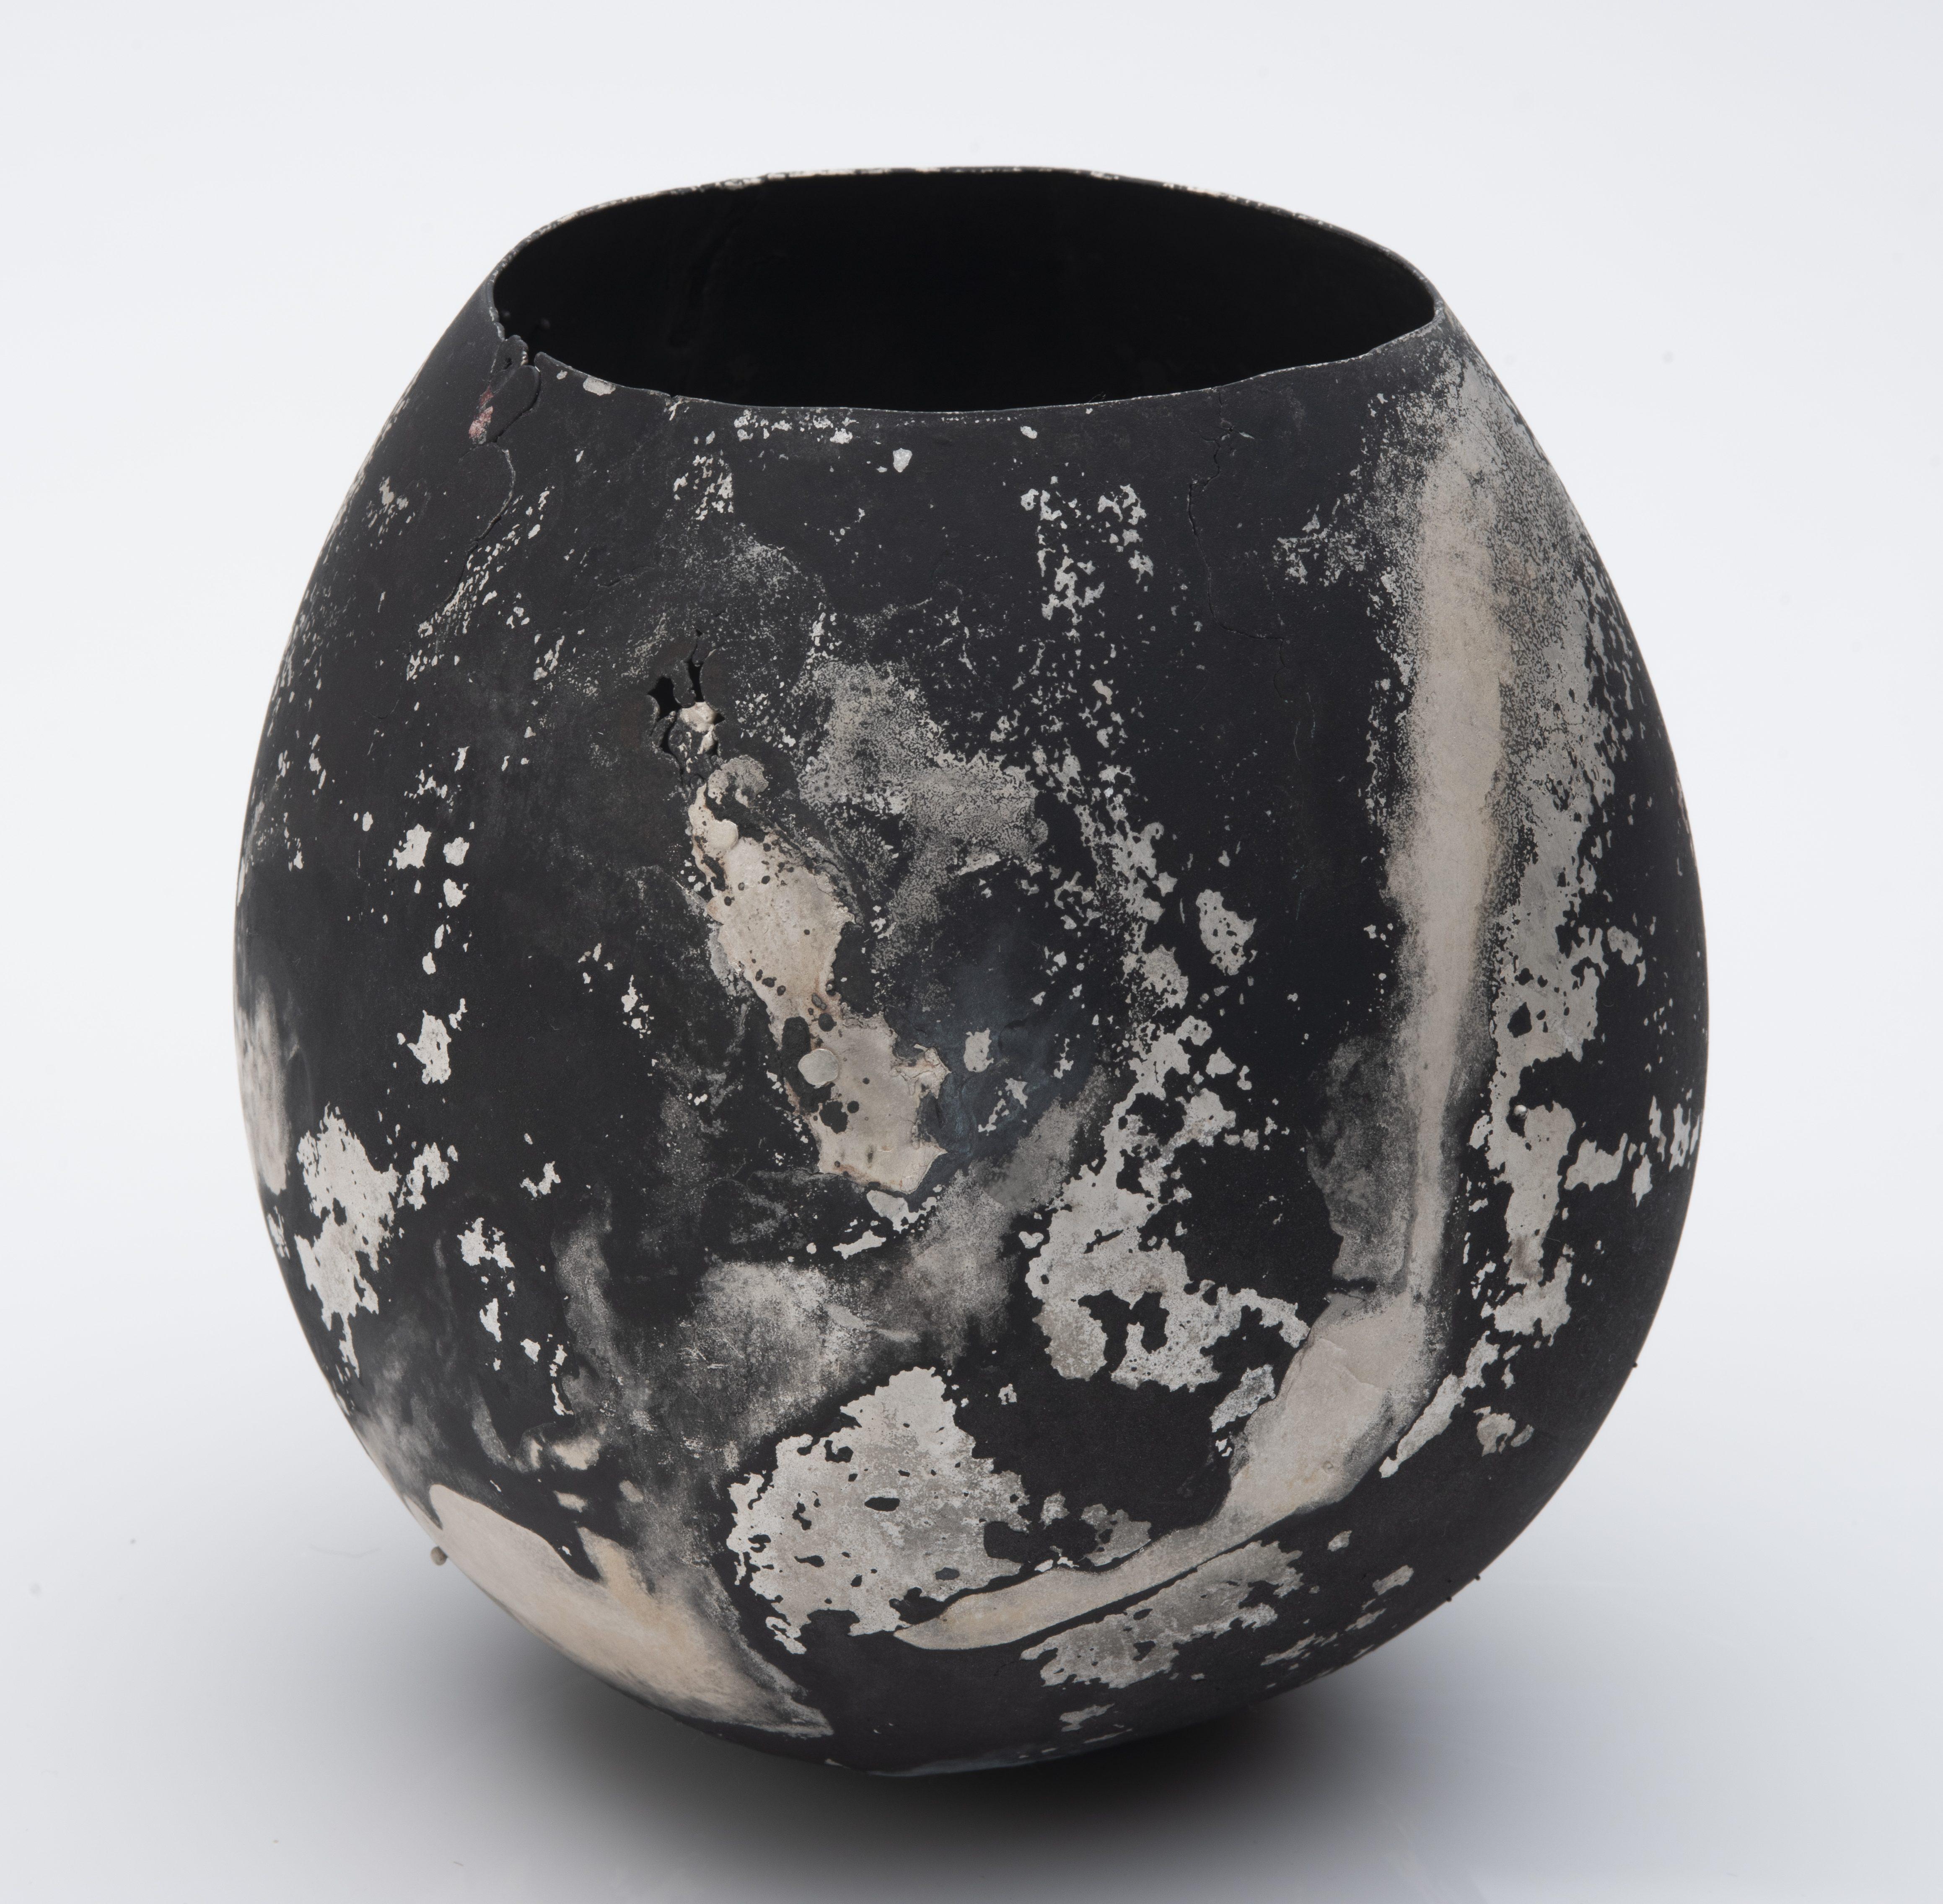 Peter Bauhuis, Policast, vaas, 2016, zilver